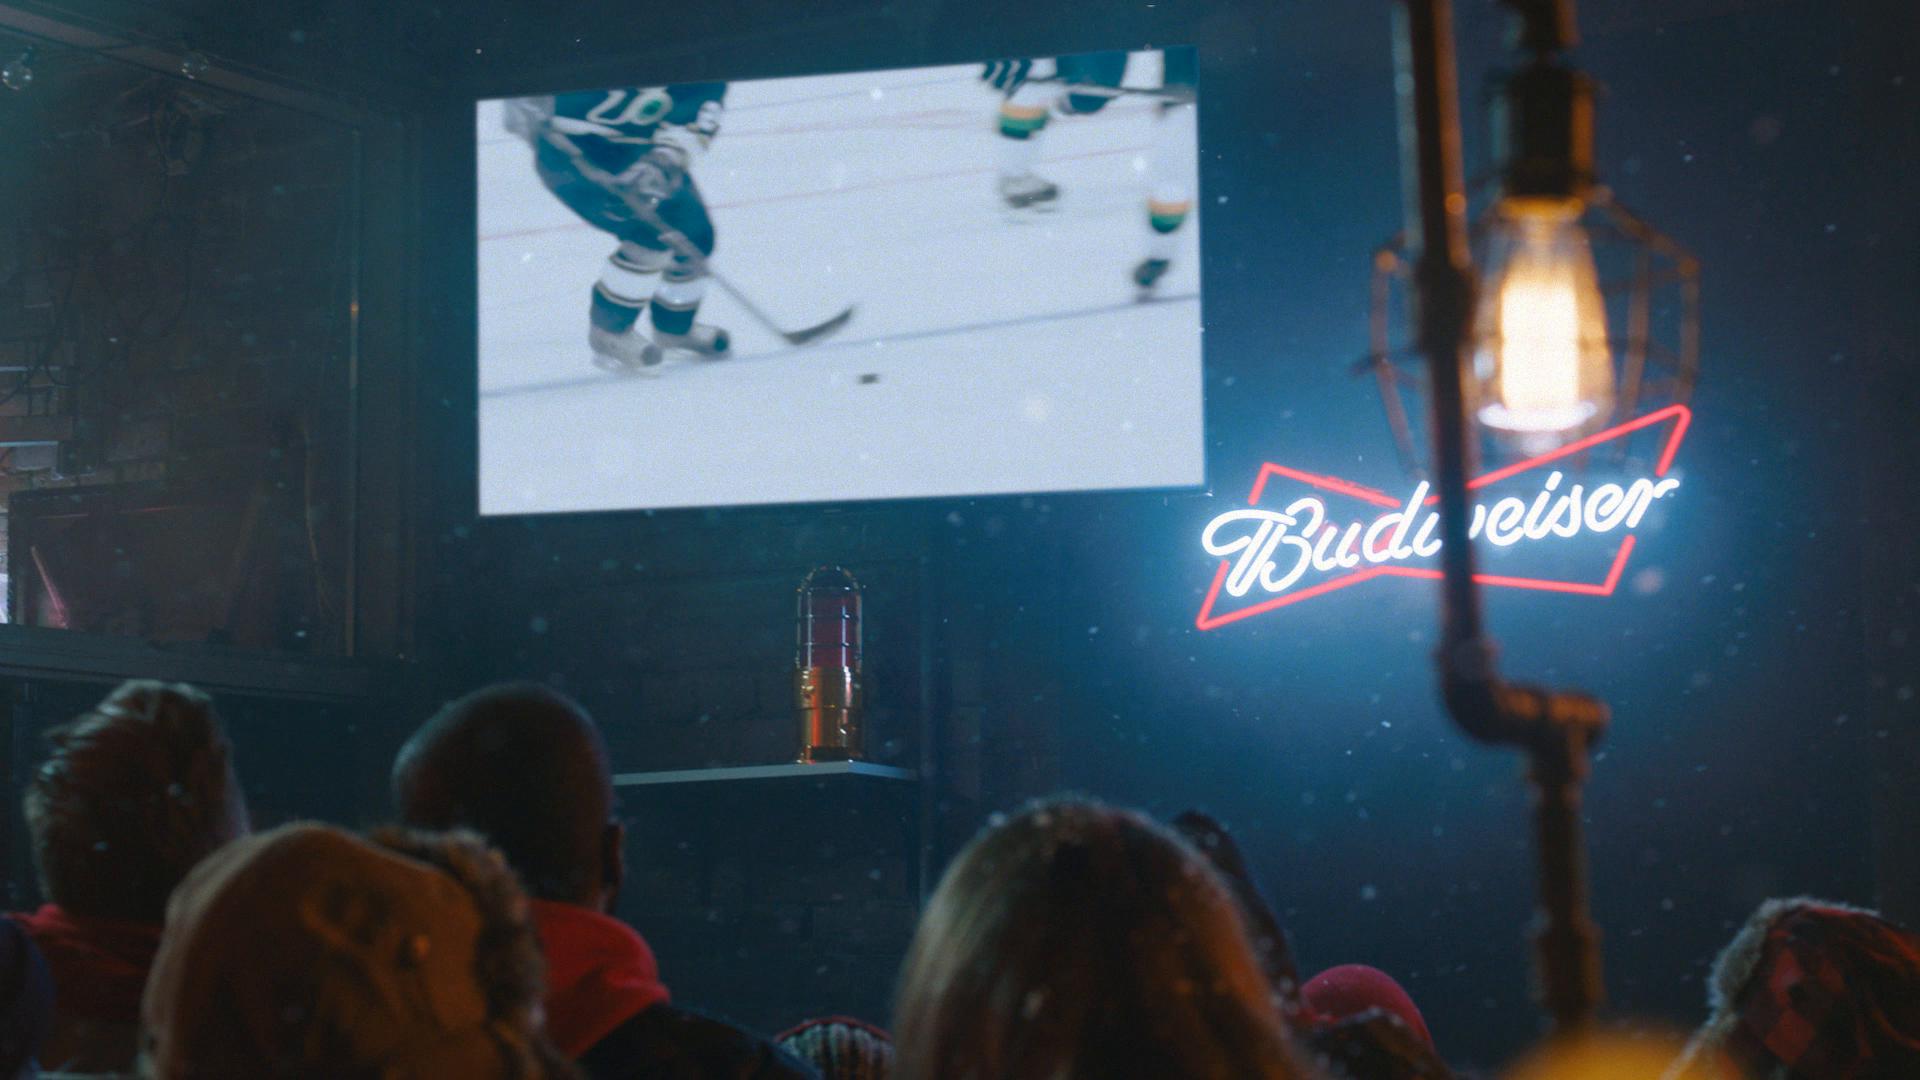 Thumbnail for Budweiser-Let it Shine